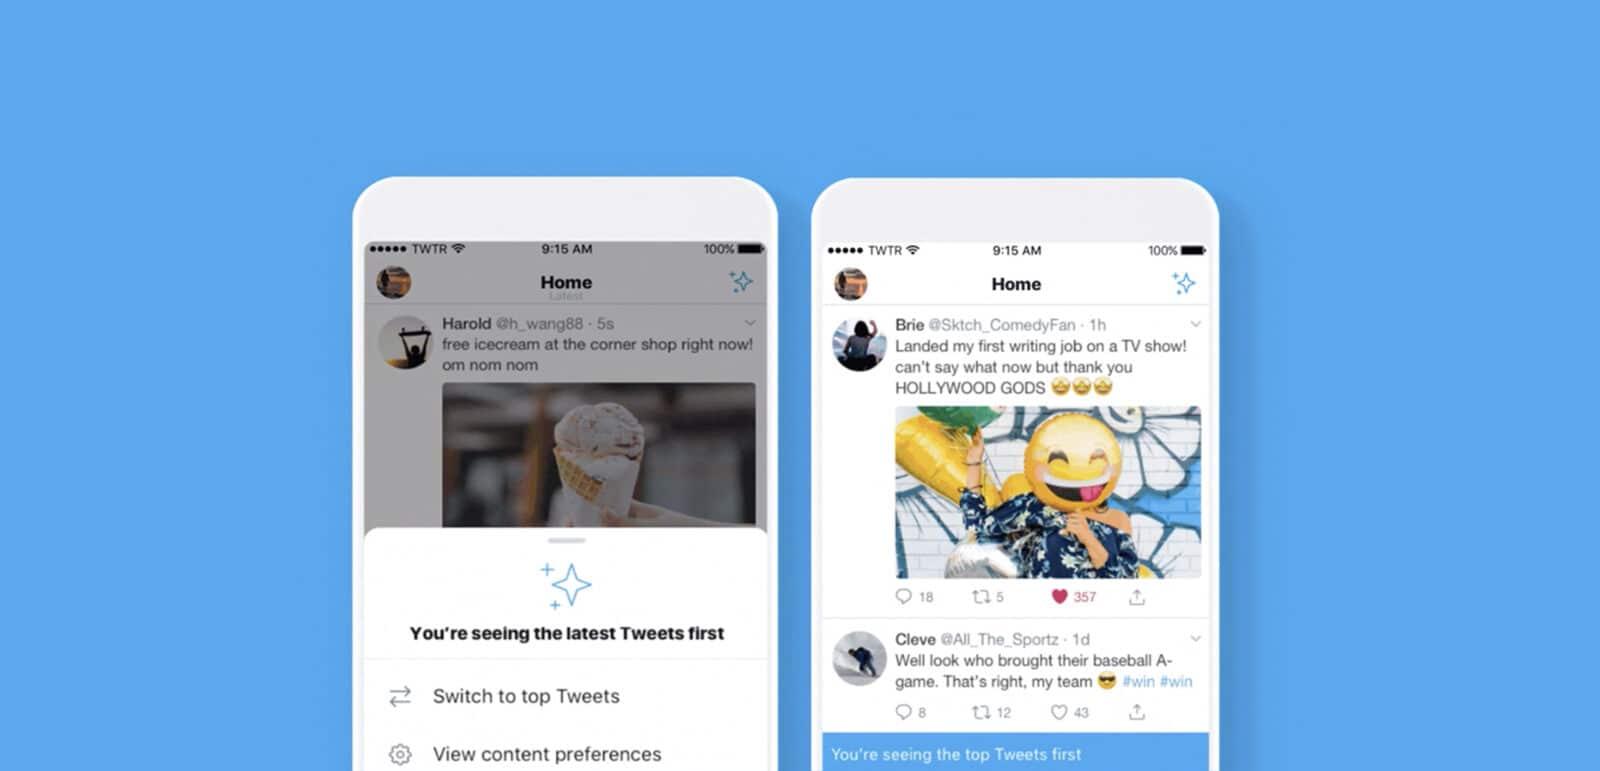 Twitter ทดสอบฟีเจอร์ที่ให้ผู้ใช้เลือกได้ว่าจะให้เรียงตามเวลาหรือตามความนิยม